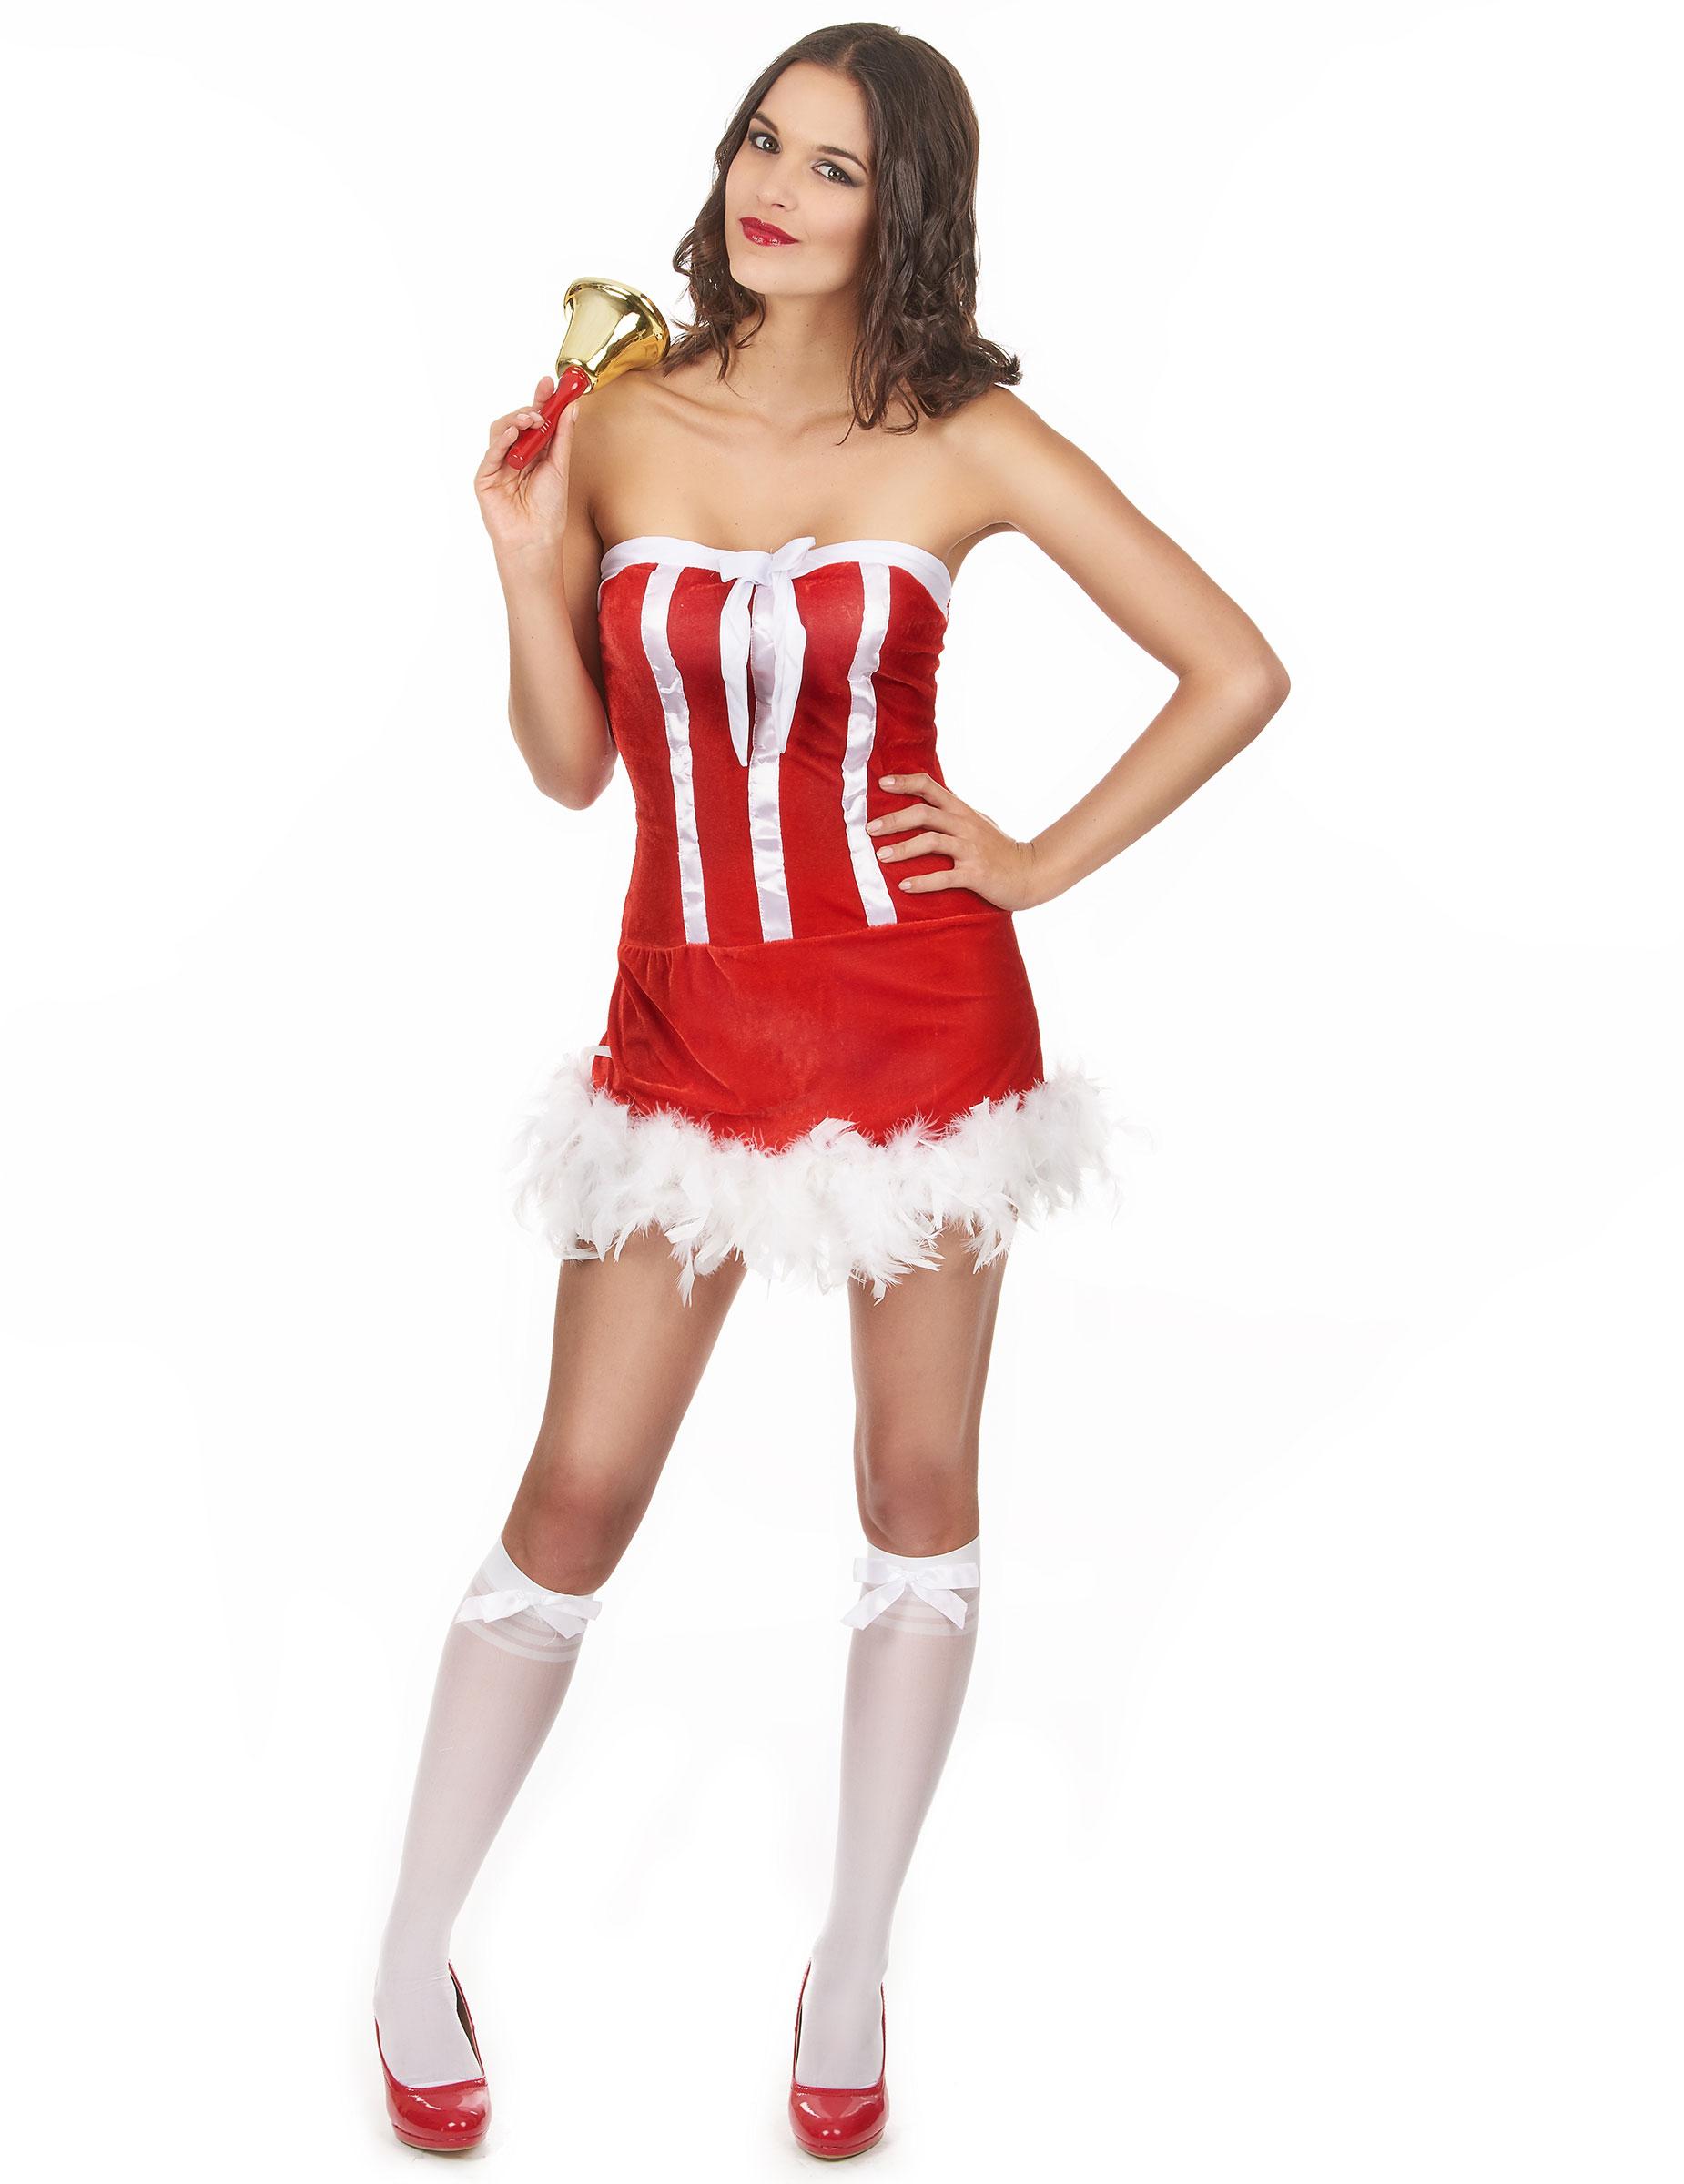 Heies Weihnachtsfrau Kostm Fr Damen Kostme Fr